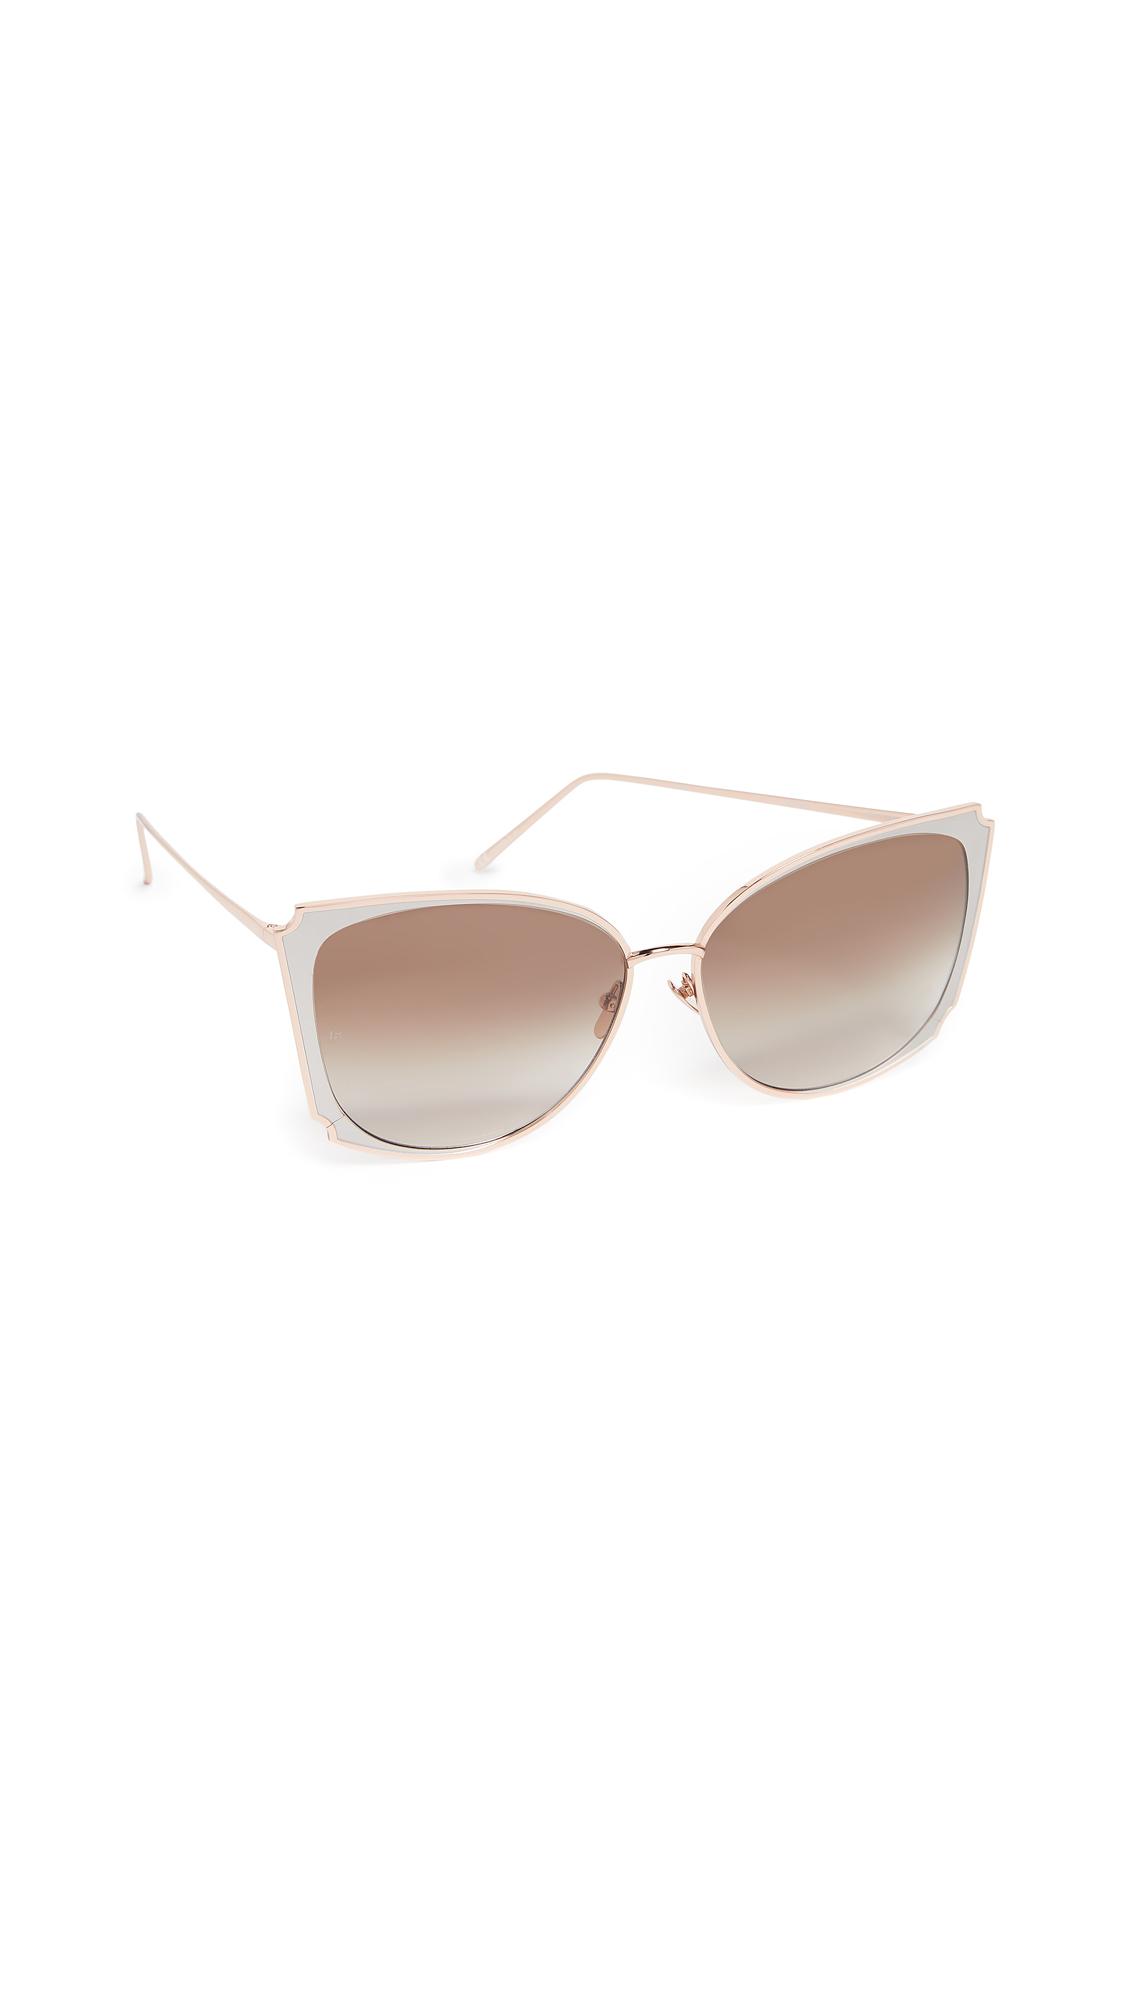 LINDA FARROW LUXE Butterfly Sunglasses in Rose Gold White/Mocha